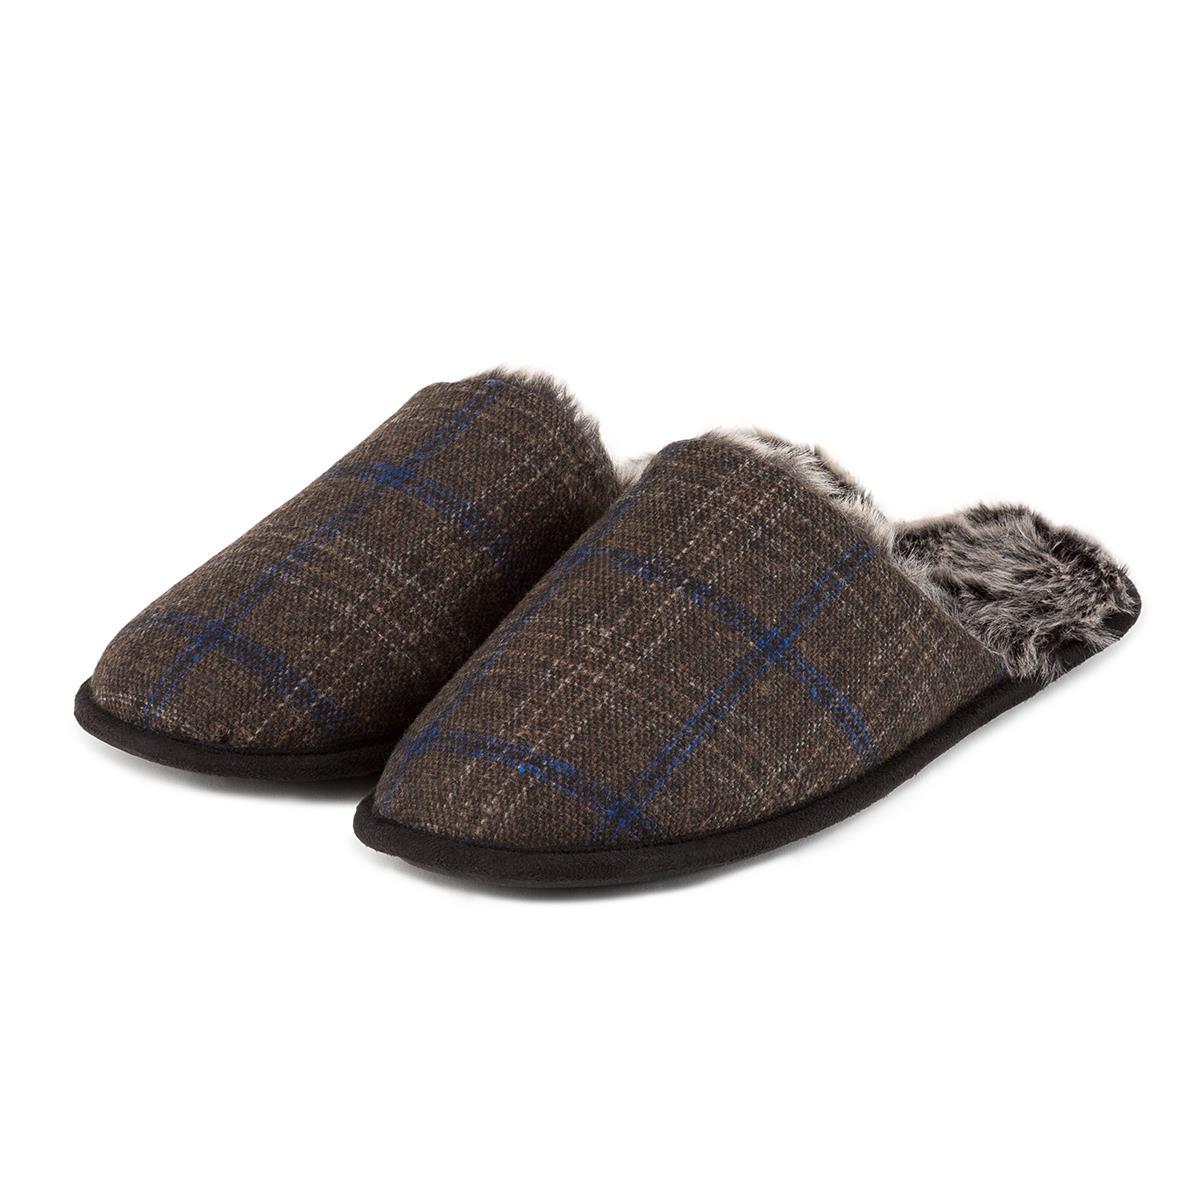 e669323e0027 totes Mens Fur Lined Check Mule Slippers Brown Check